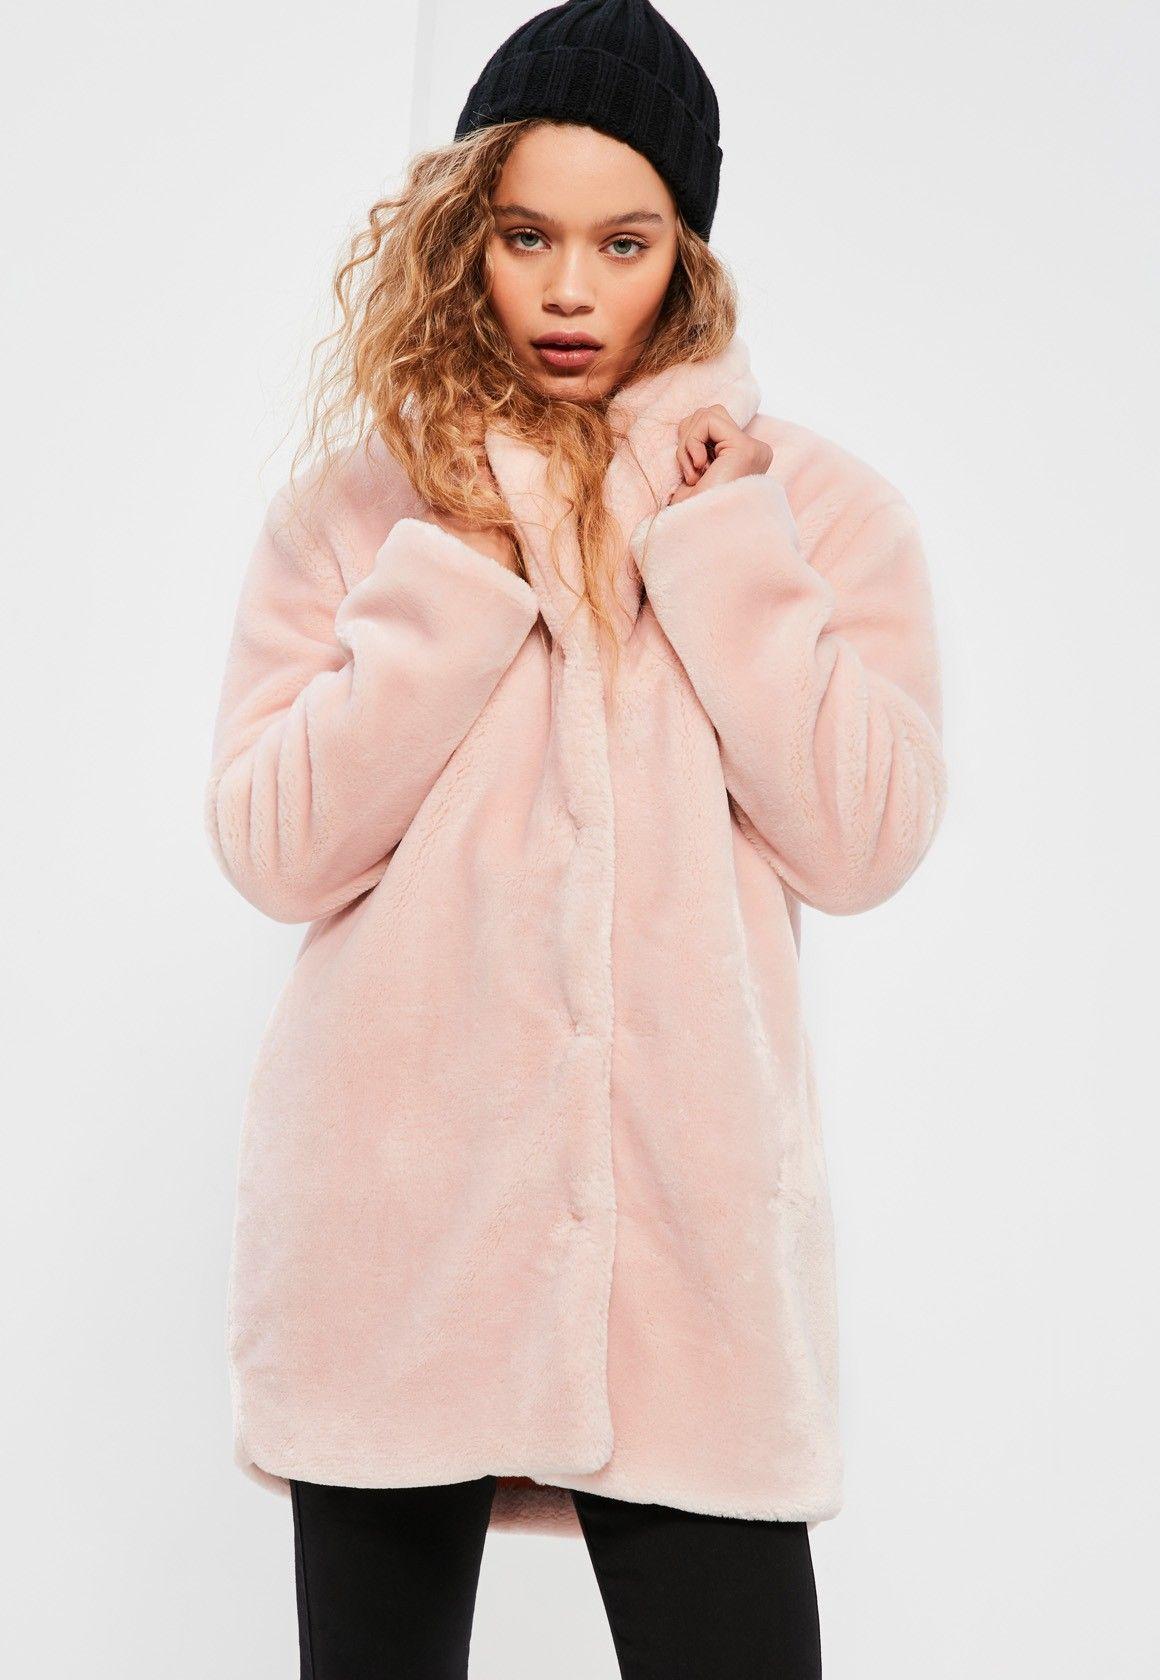 Missguided - Petite Pink Faux Fur Coat   Winter/Fall Stuff